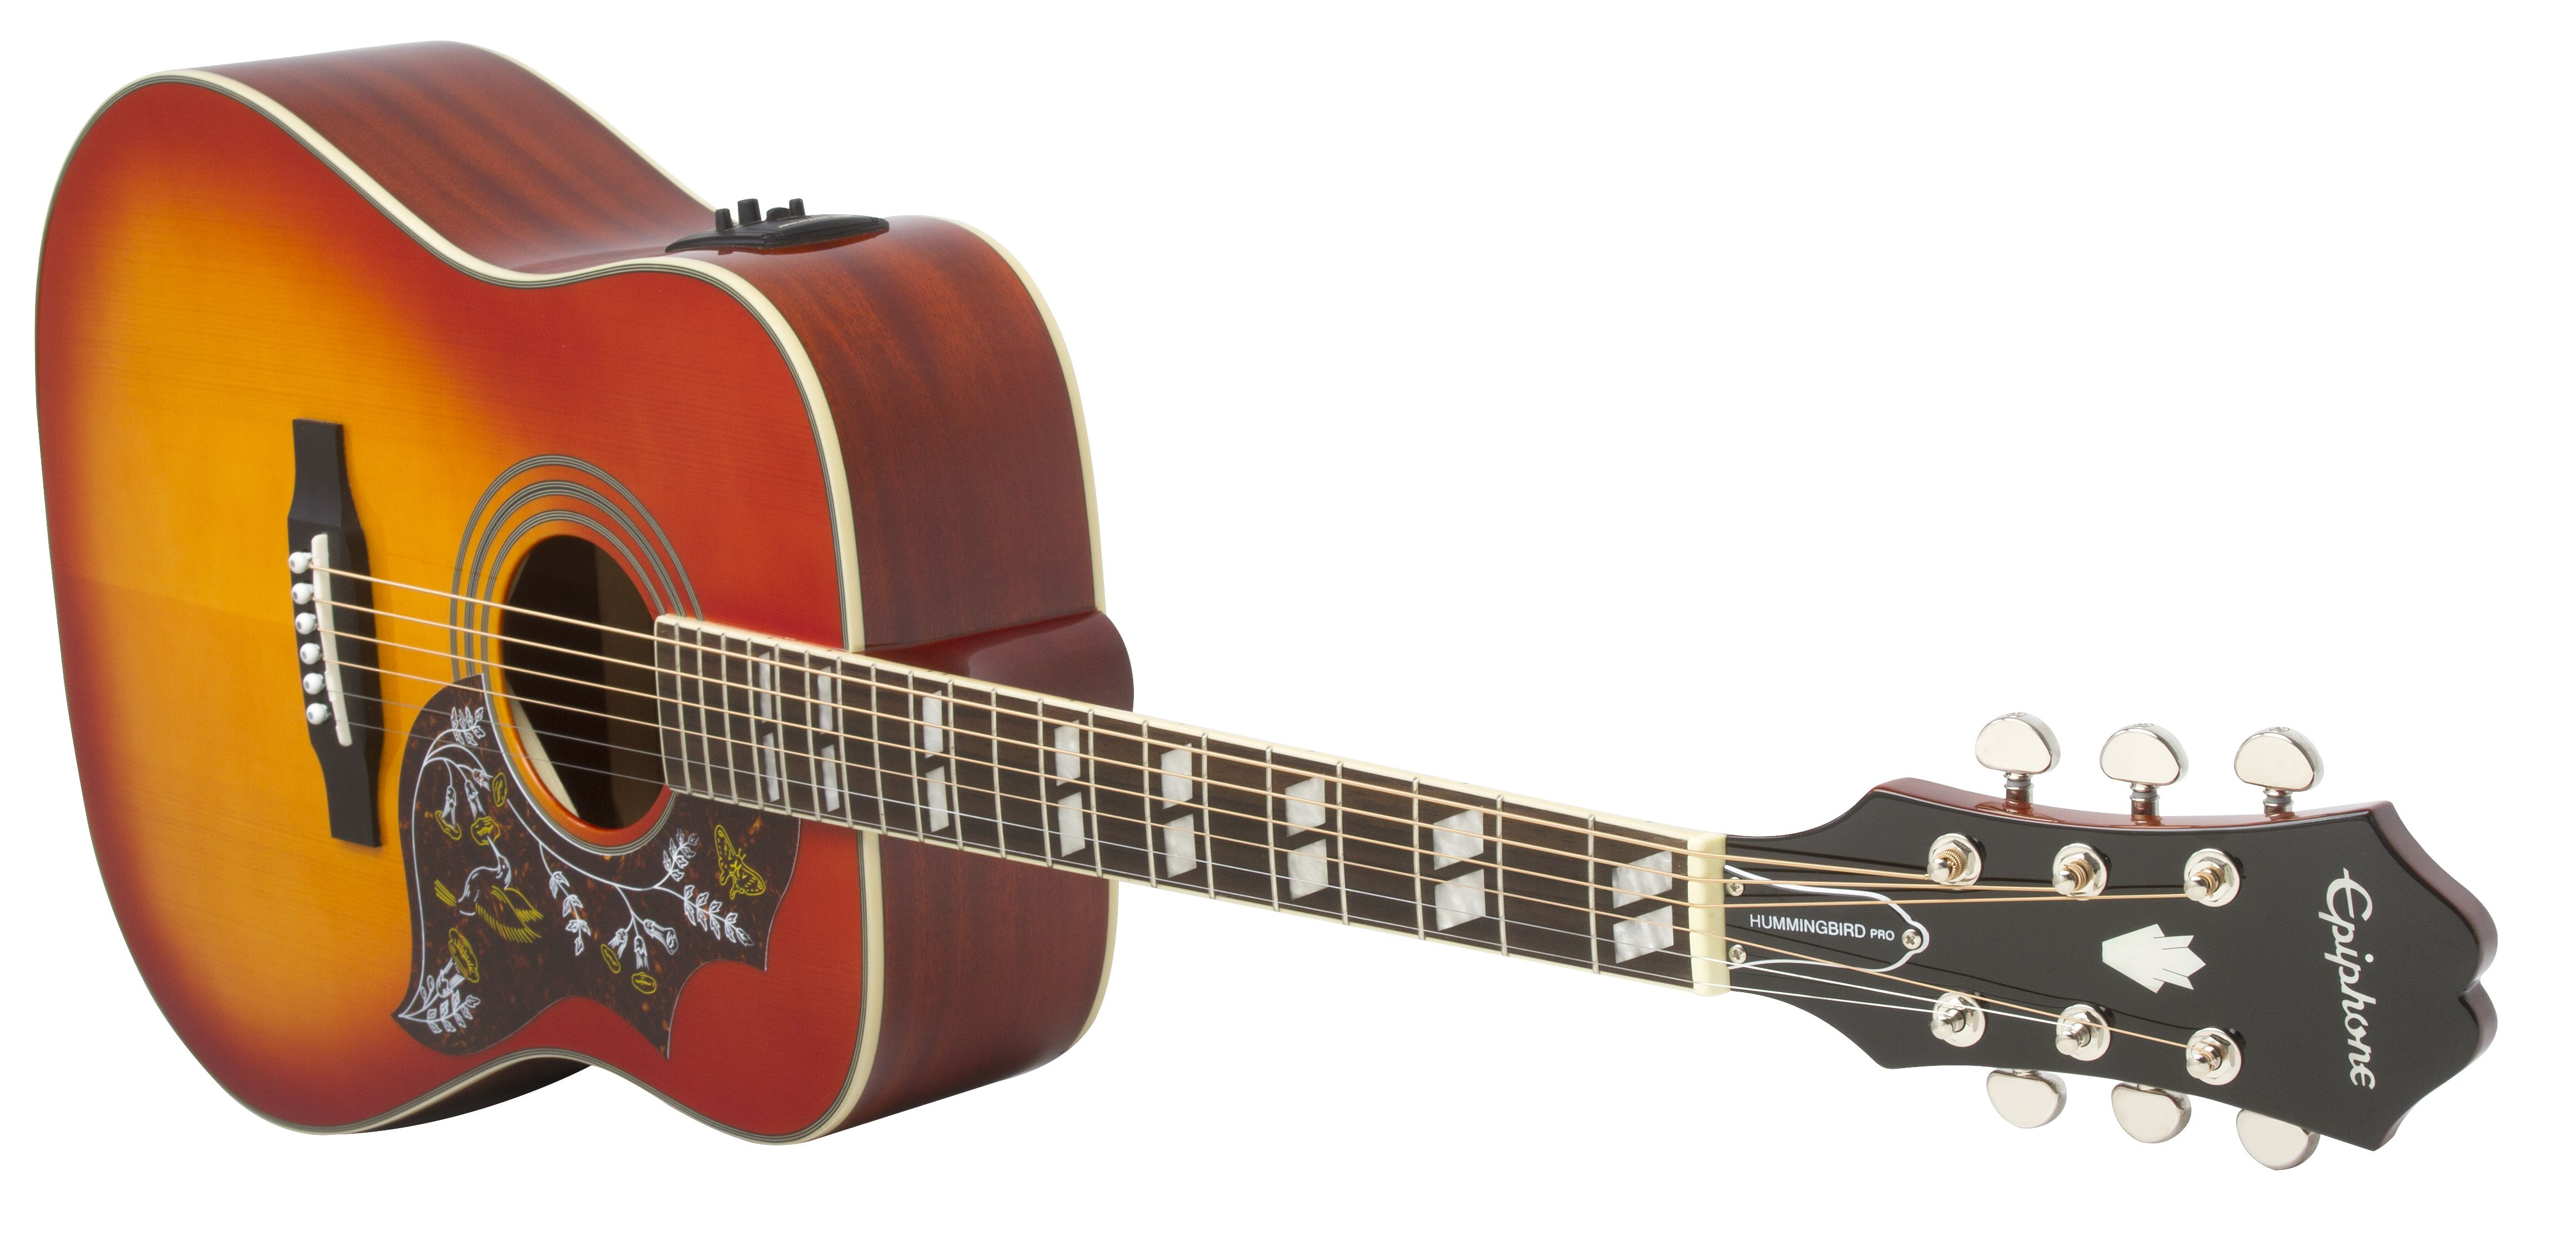 Epiphone Hummingbird Pro Acoustic Imagen Jpeg 4639 2237 Pixels Epiphone Epiphone Acoustic Guitar Guitar